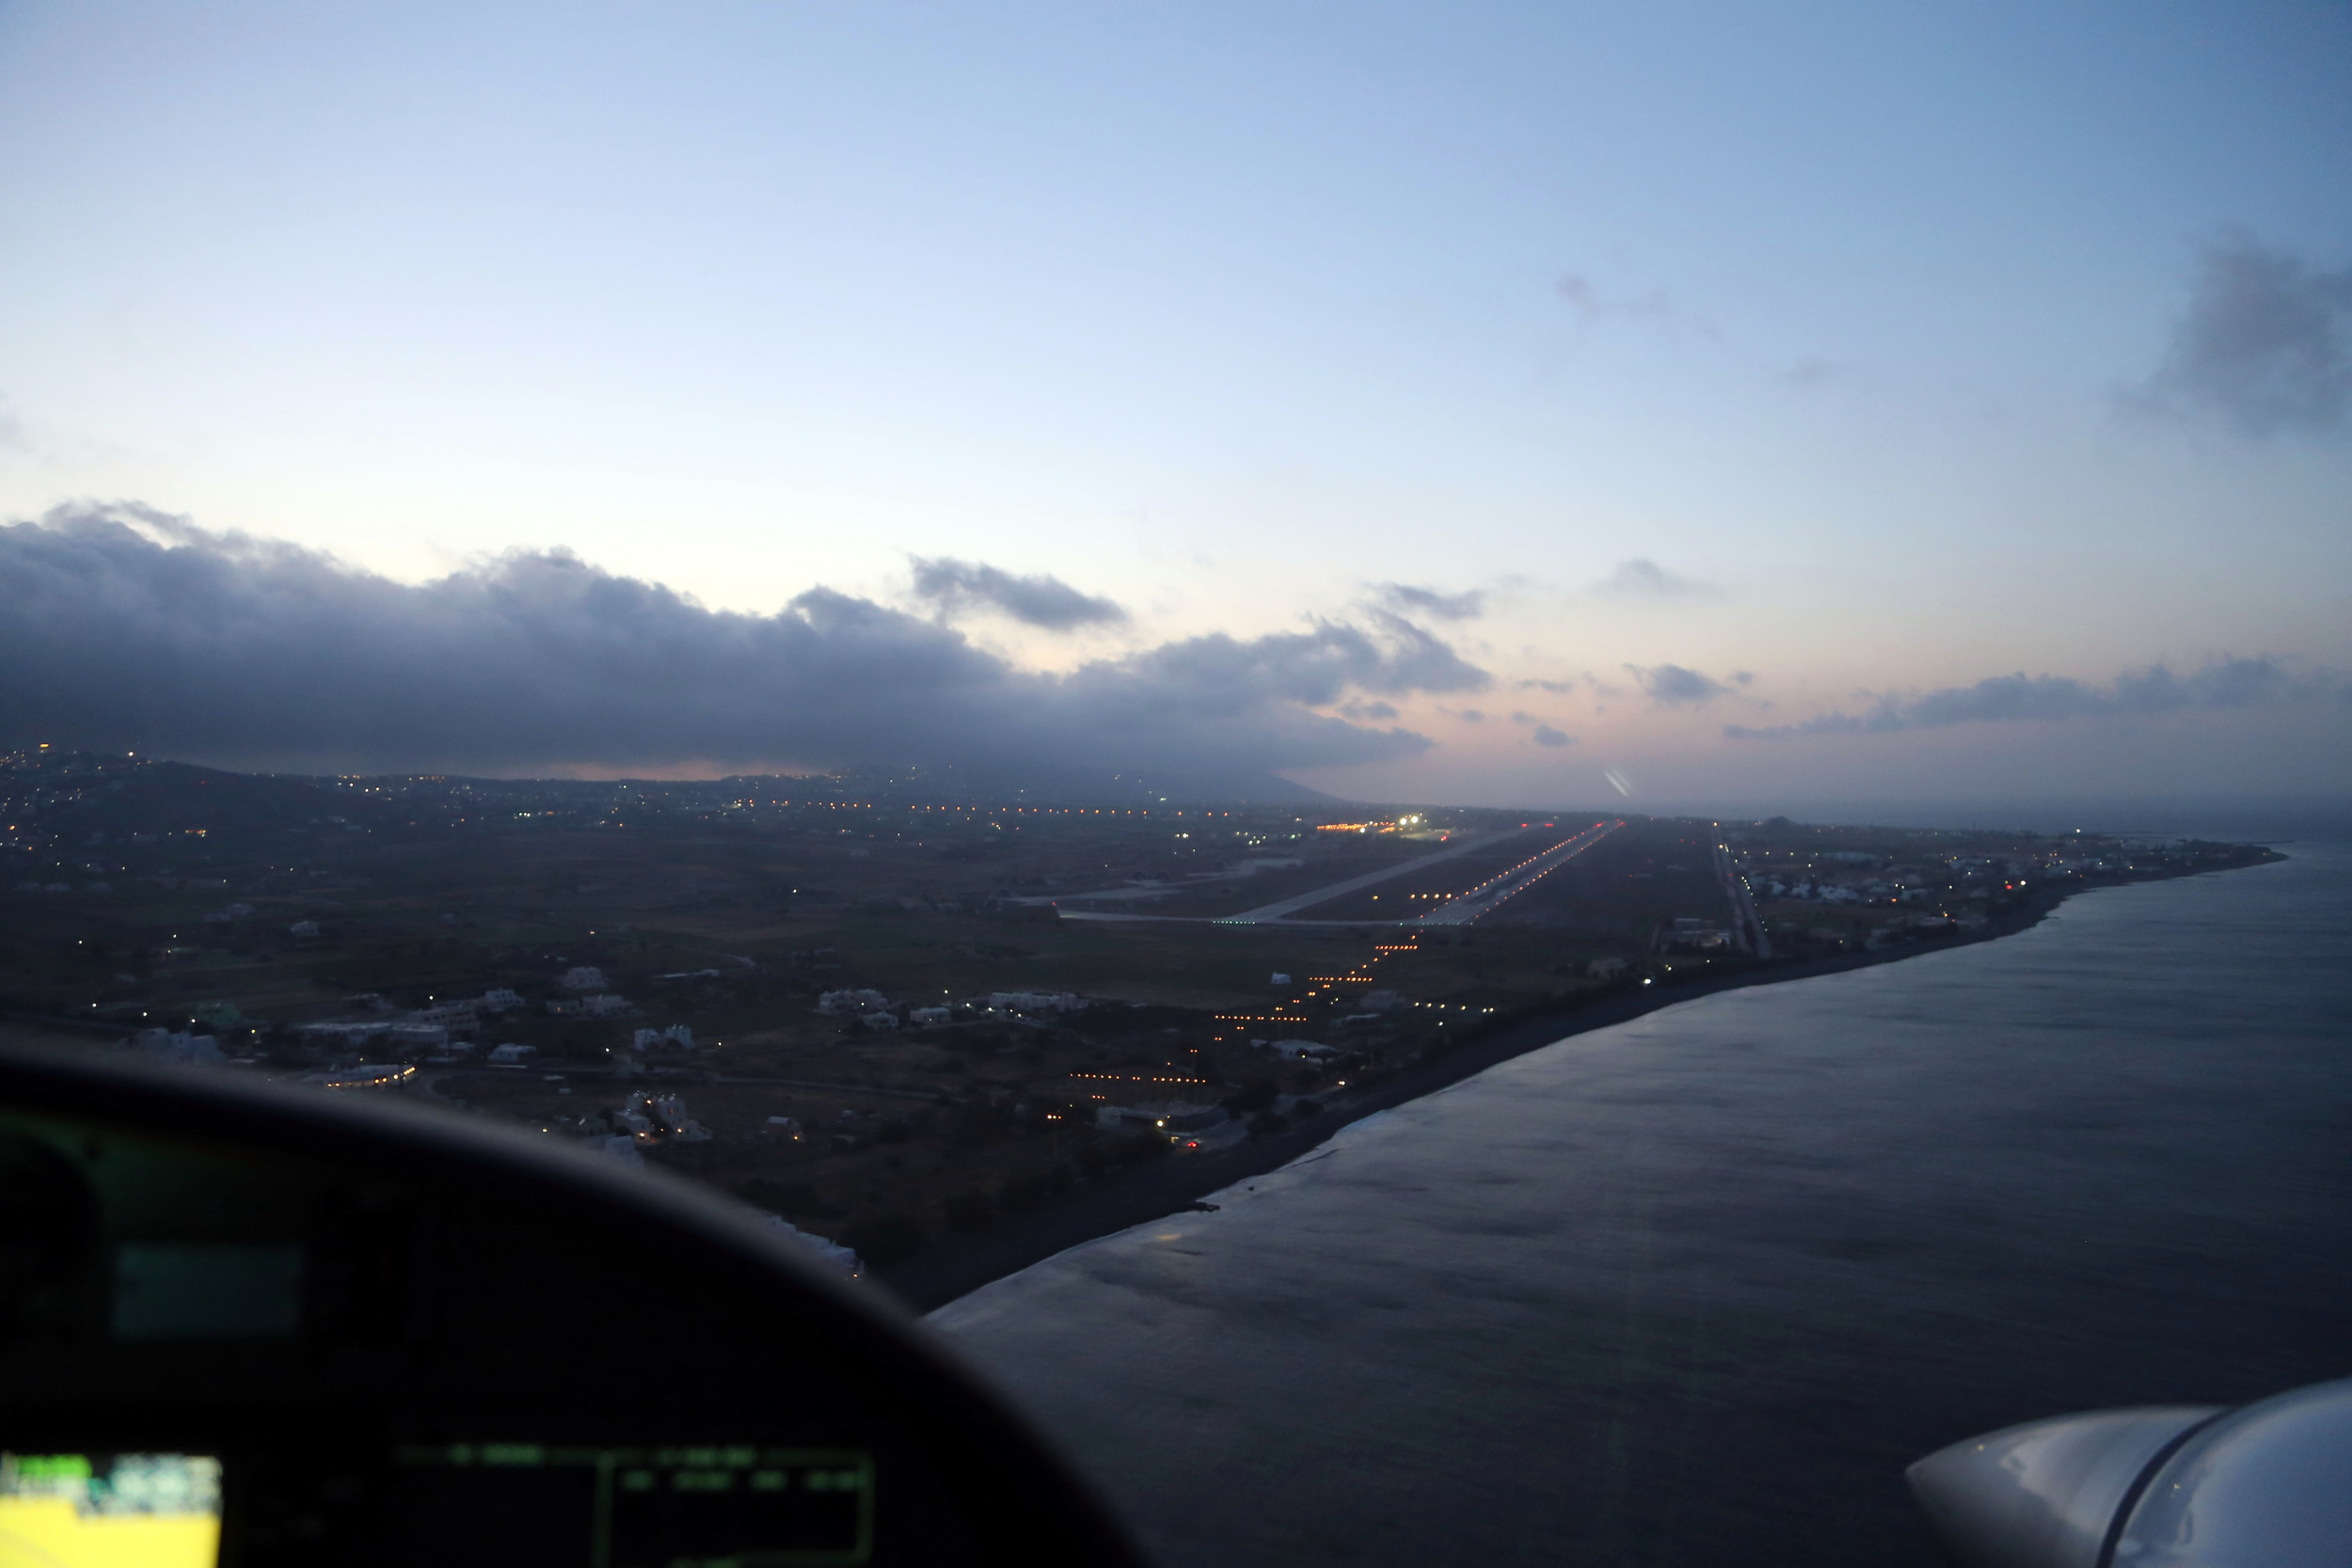 20140425 048 DA42 N181CW approaching Santorini.JPG